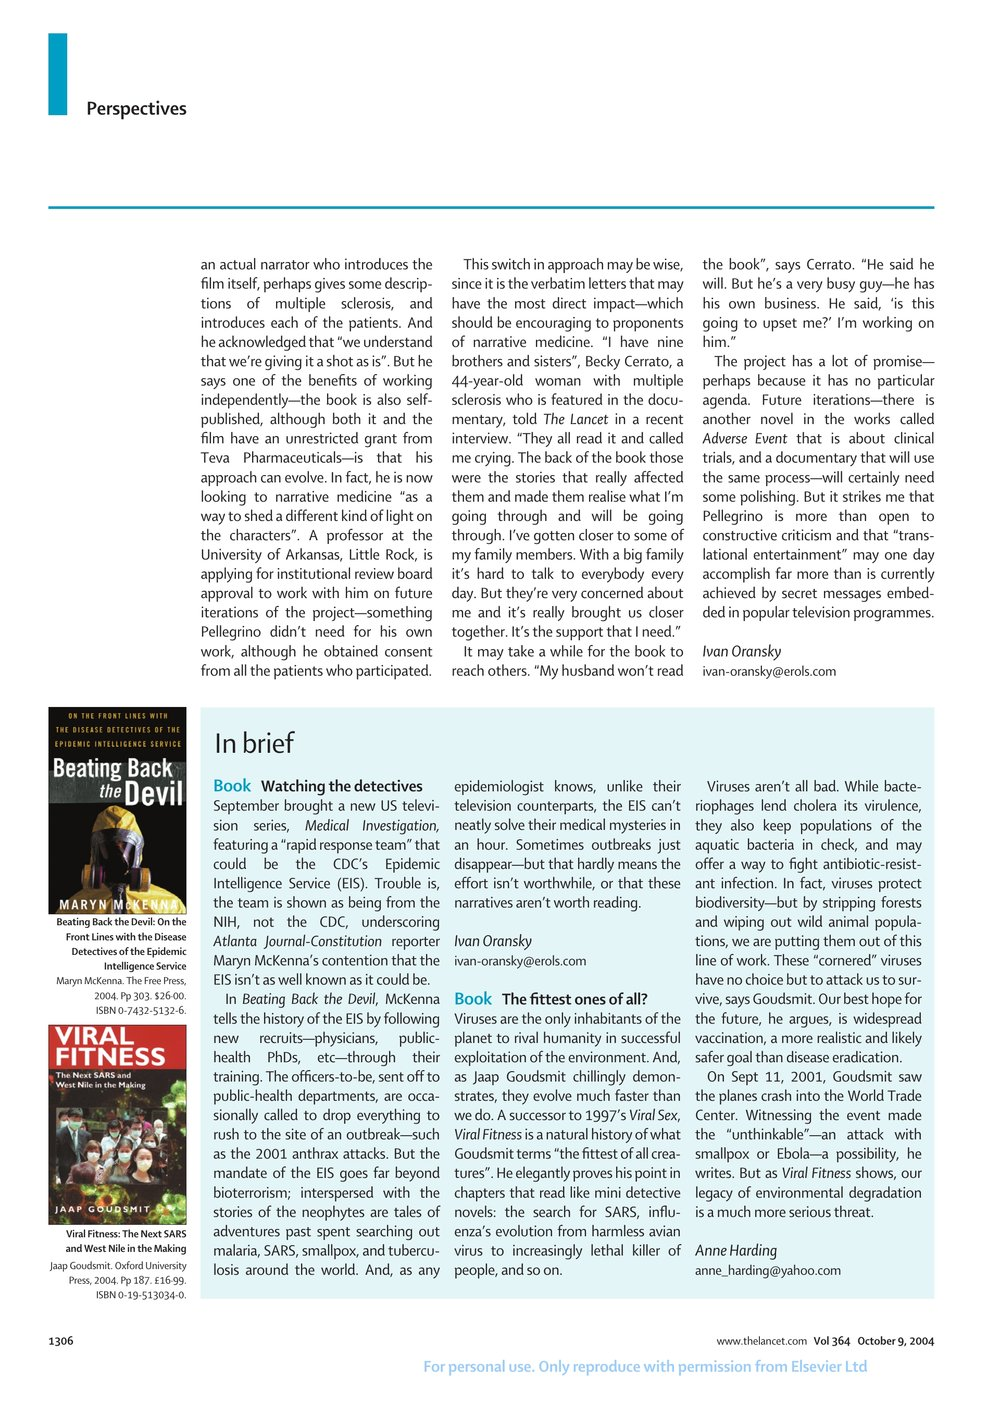 Lance Article - pg 2 of 2.jpg